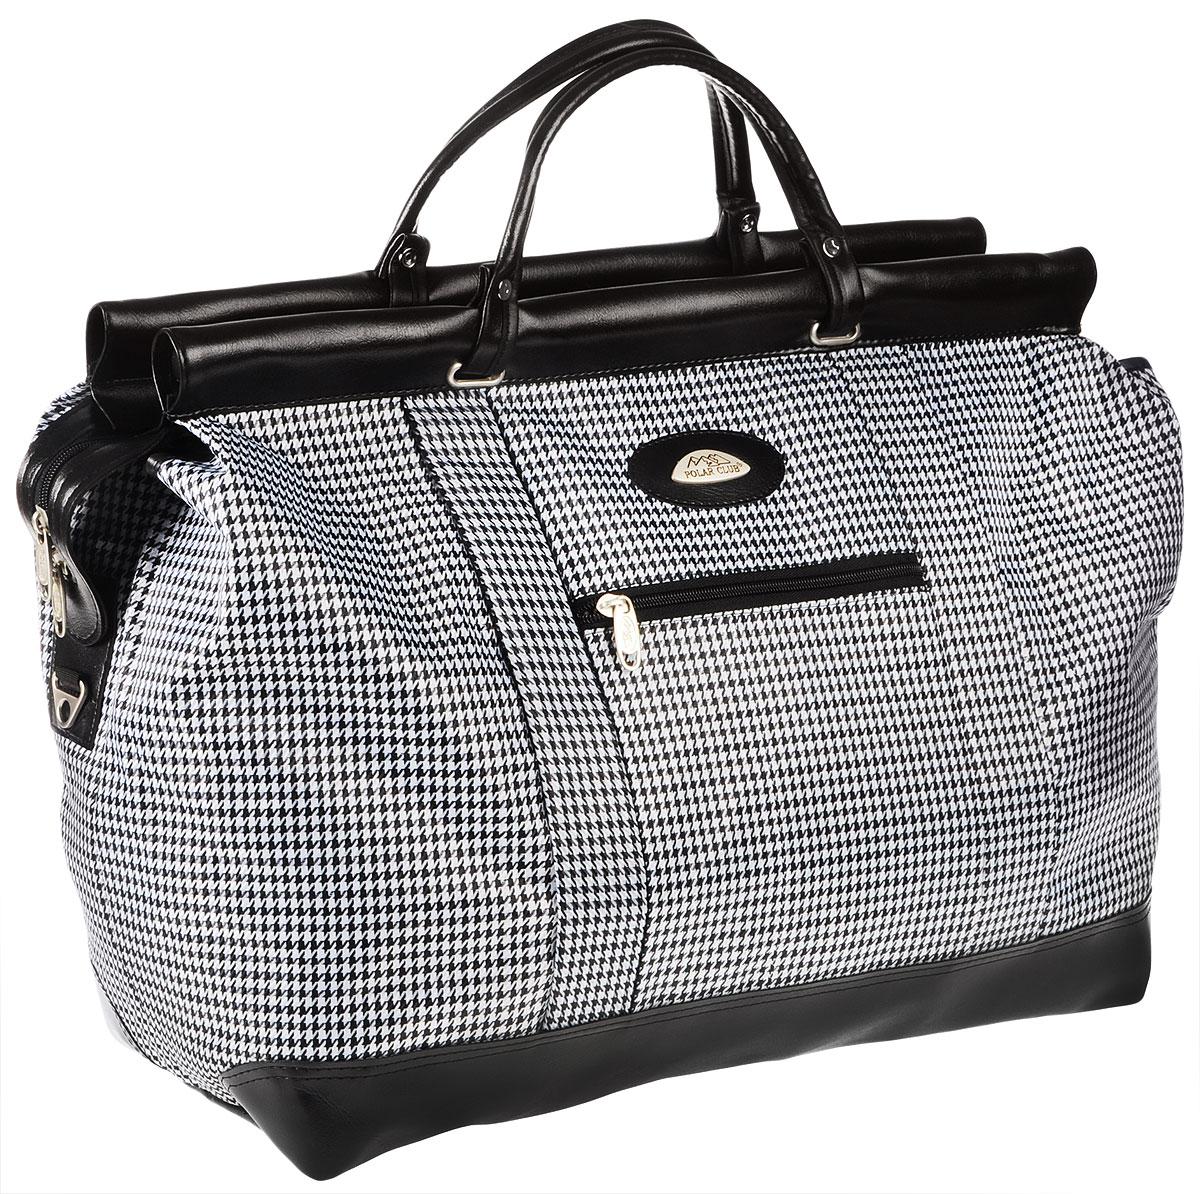 Сумка дорожная Polar, цвет: черный, белый, 47 л. 7021 сумка дорожная polar цвет бордовый 46 5 л 7049 2